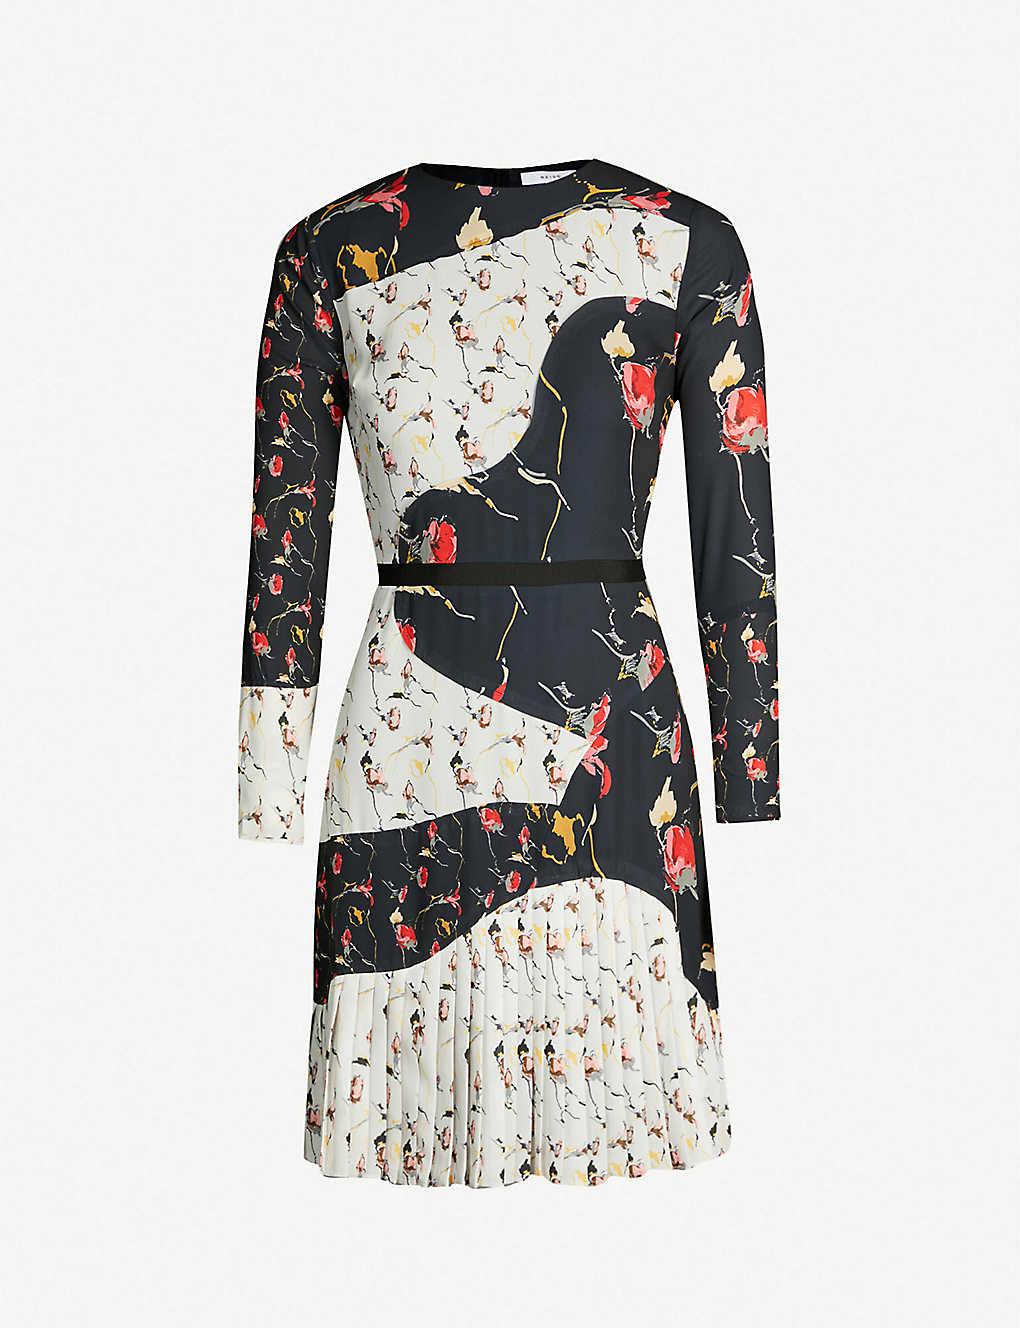 968dbc887b REISS - Mara mixed print long-sleeved dress | Selfridges.com